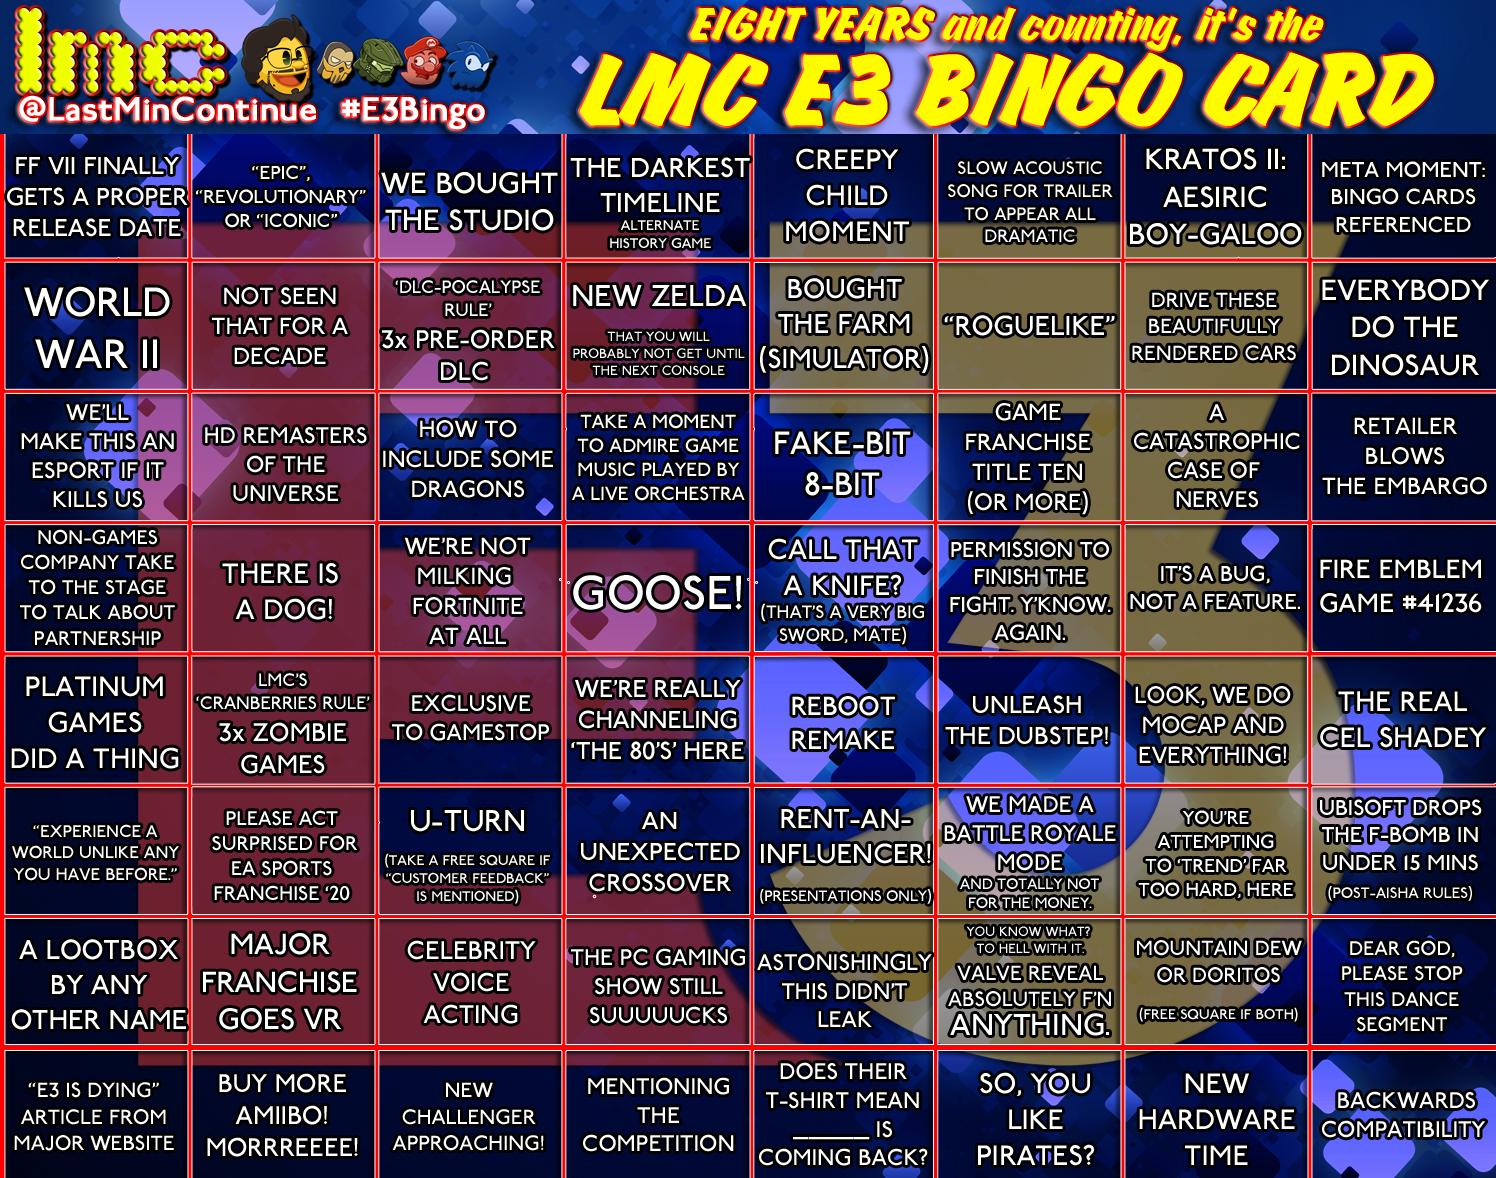 LMC's E3 Bingo Card 2019